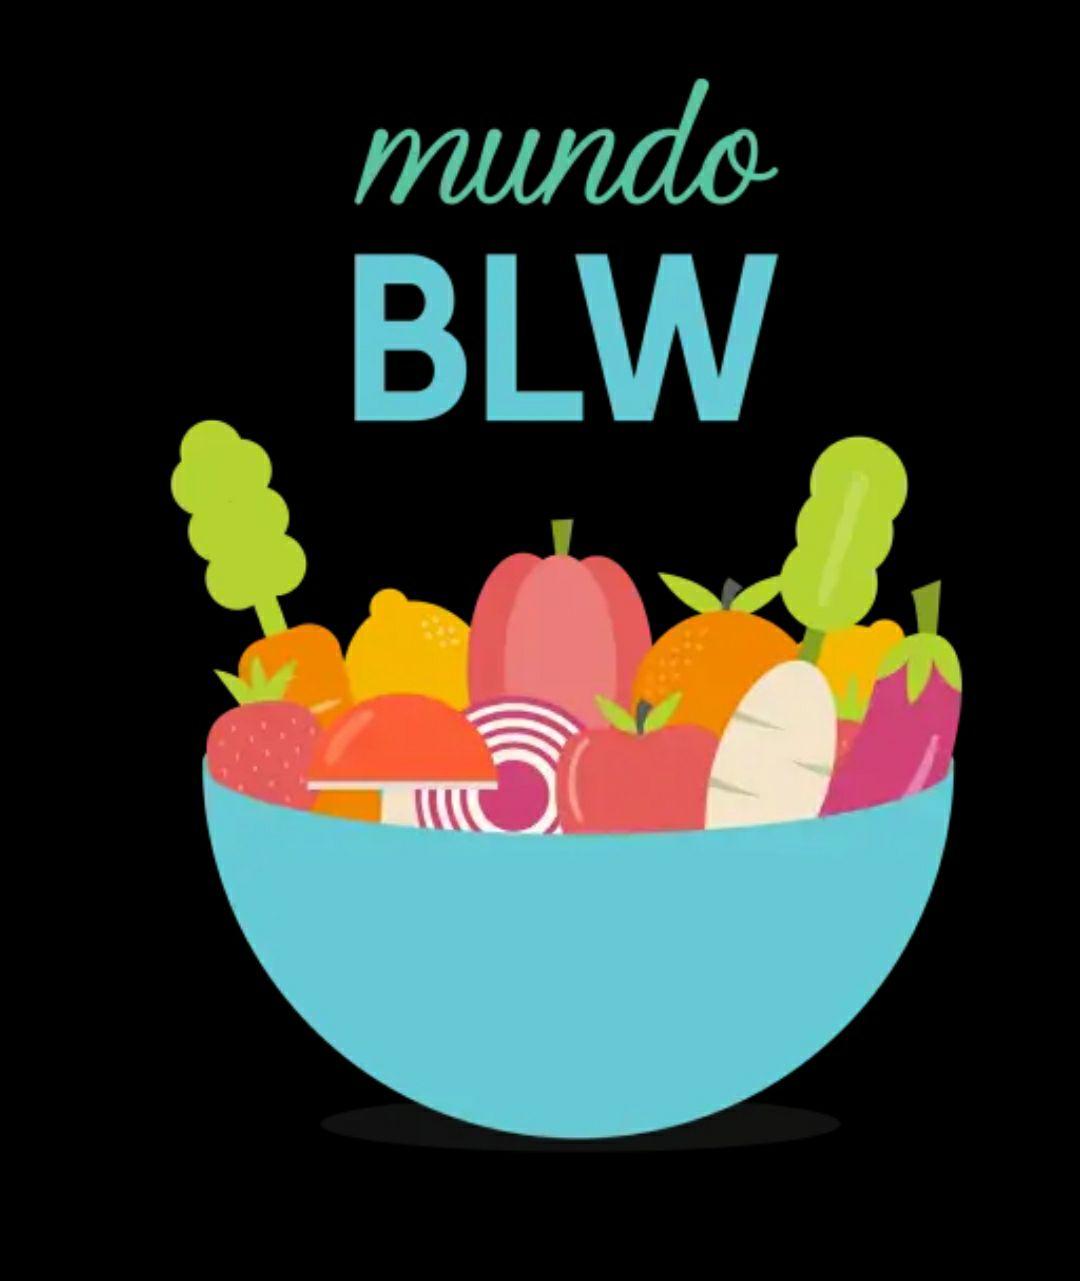 Mundo BLW - Baby Let Winning